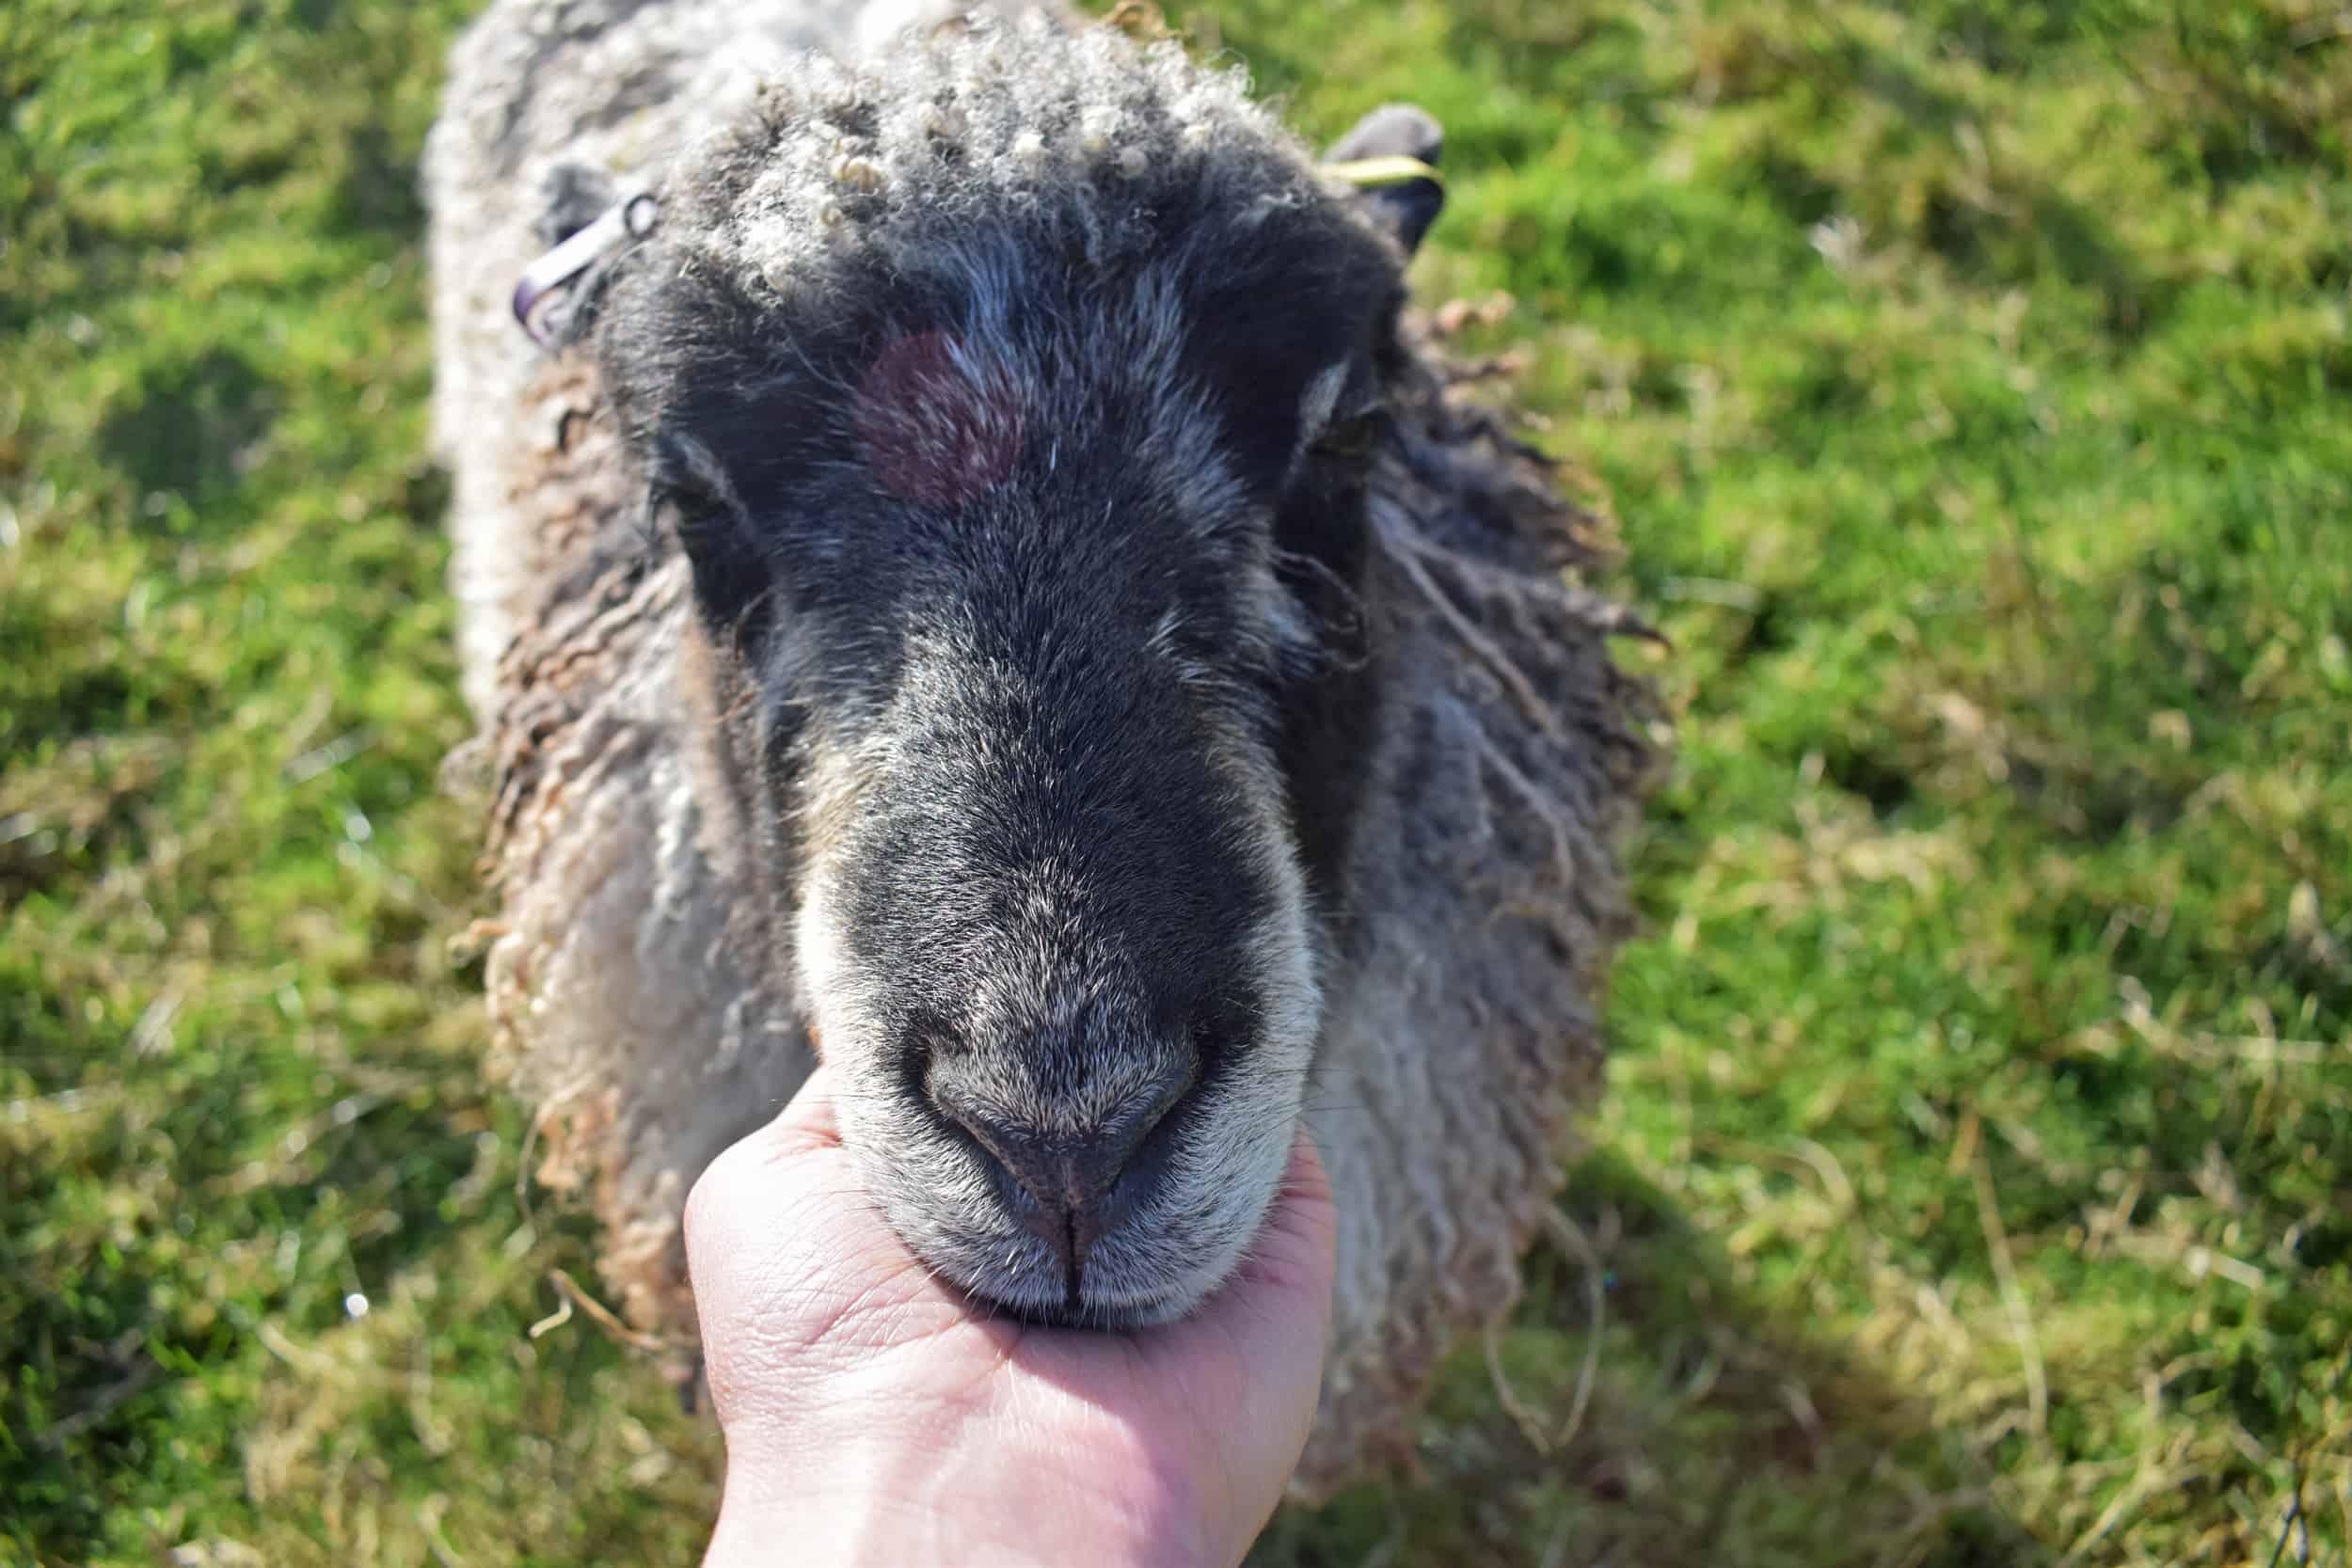 Jemima sheep farm animals coloured leicester longwool gotland sheep shetland ewe lamb kind fibre british wool grey animal friends